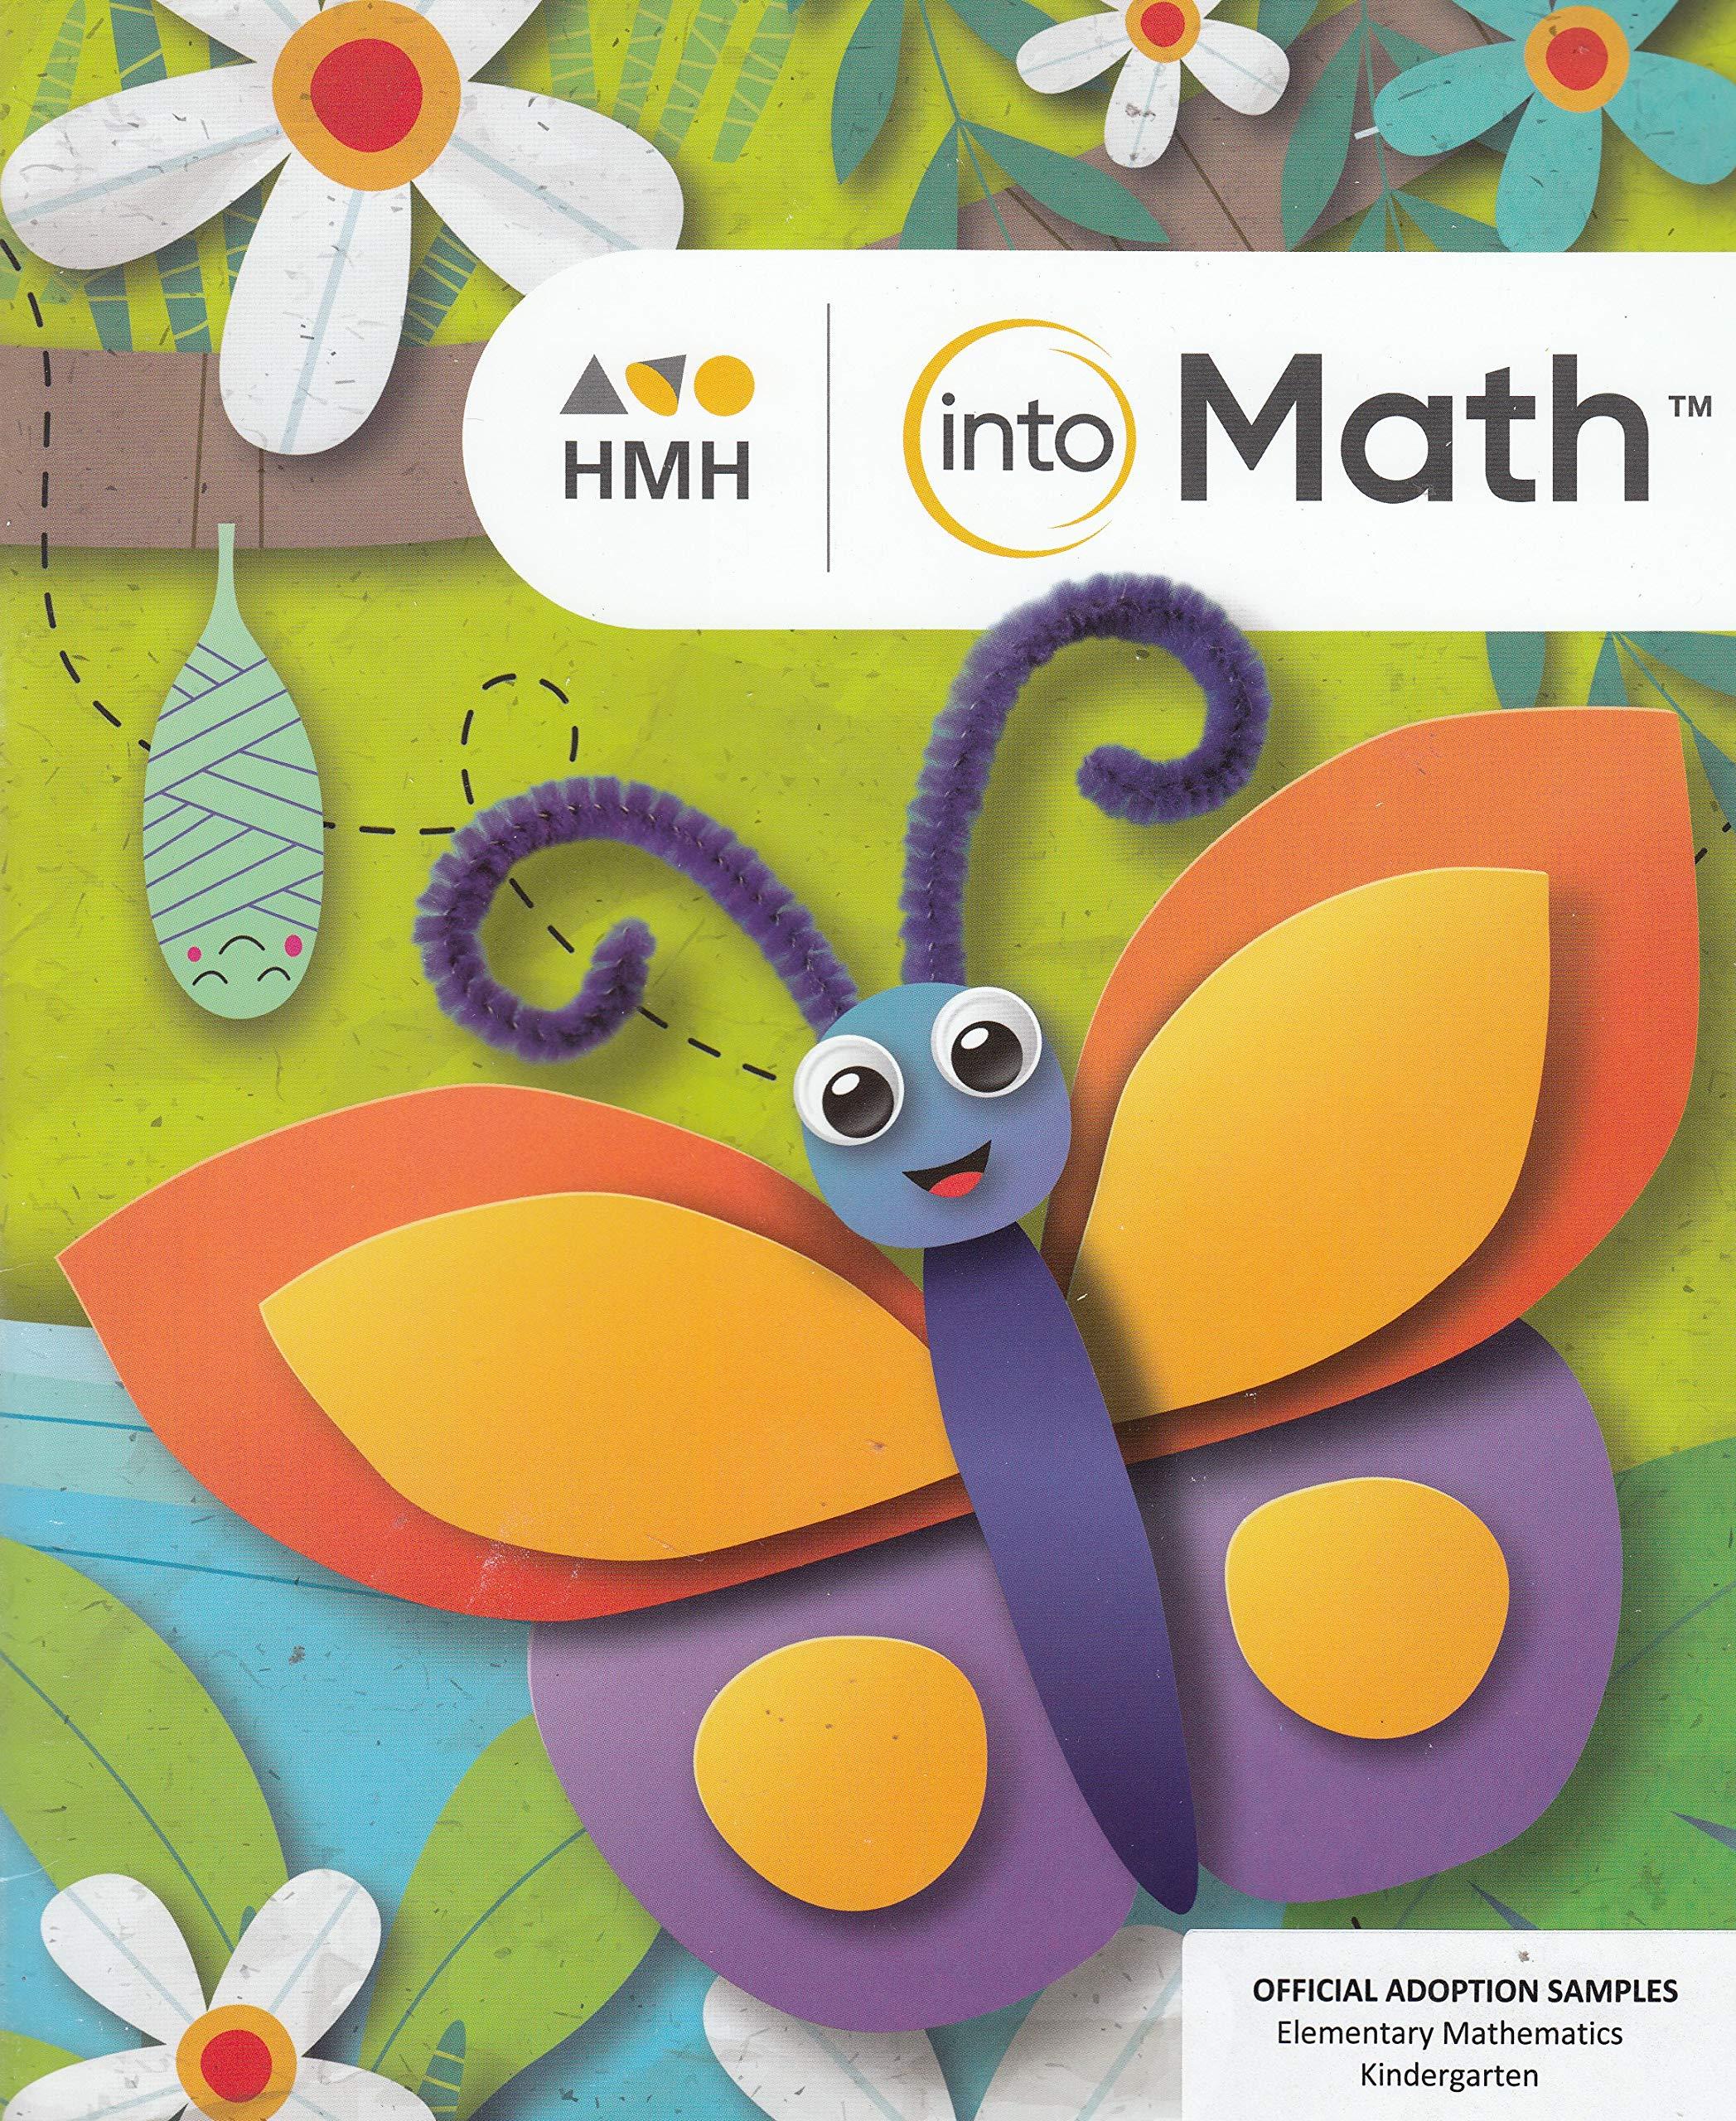 HMH: into Math Student workbook Grade K, Modules 1-3: Juli Dixon, Timothy  Kanold: 9780358002062: Amazon.com: Books